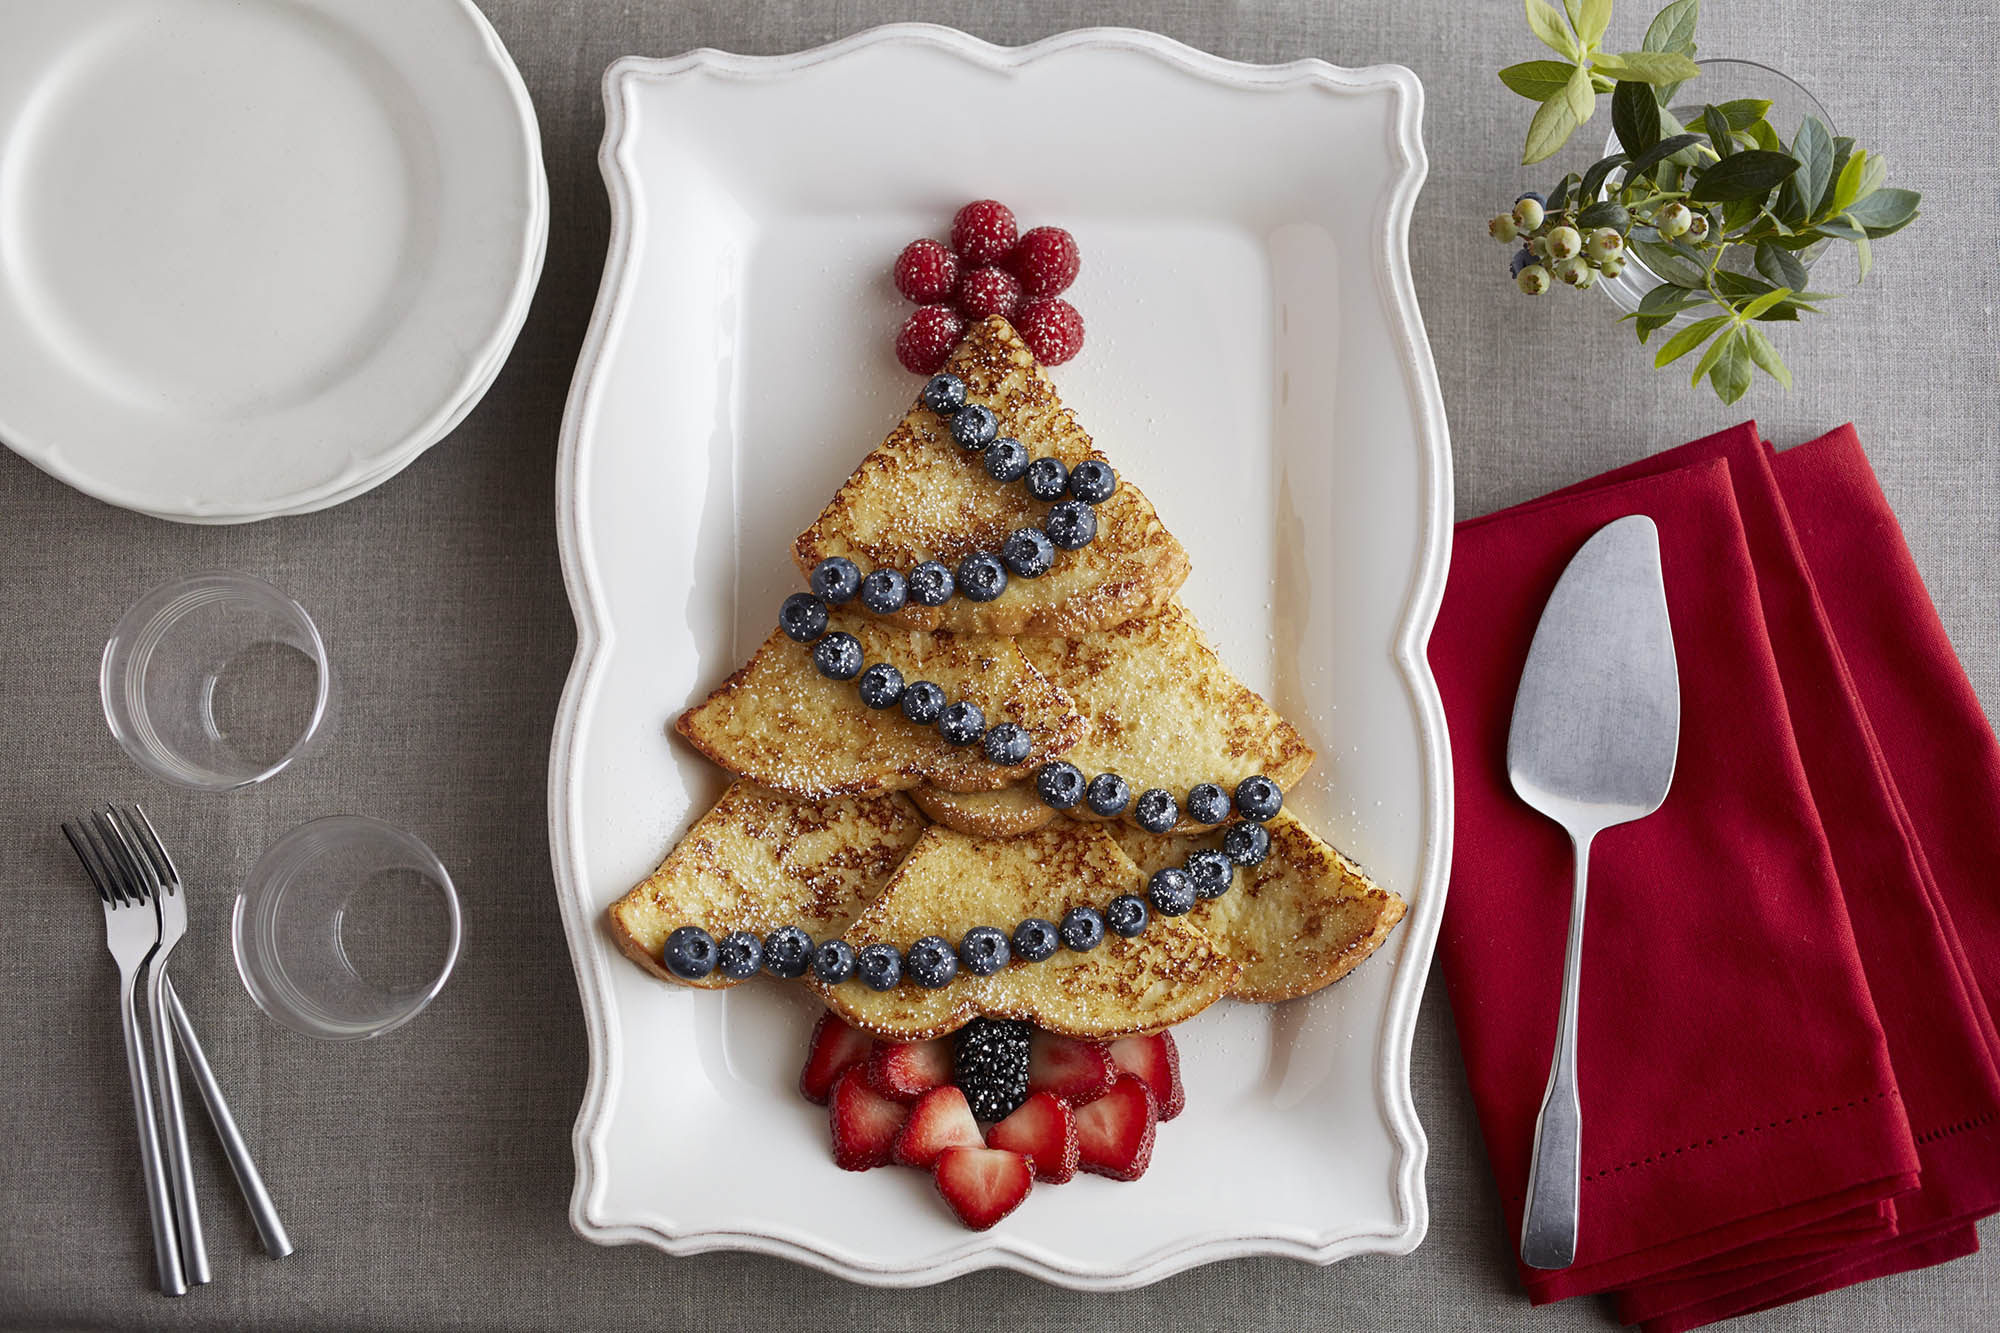 Christmas tree eggnog french toast eggnog french toast decorated in the shape of christmas trees forumfinder Choice Image